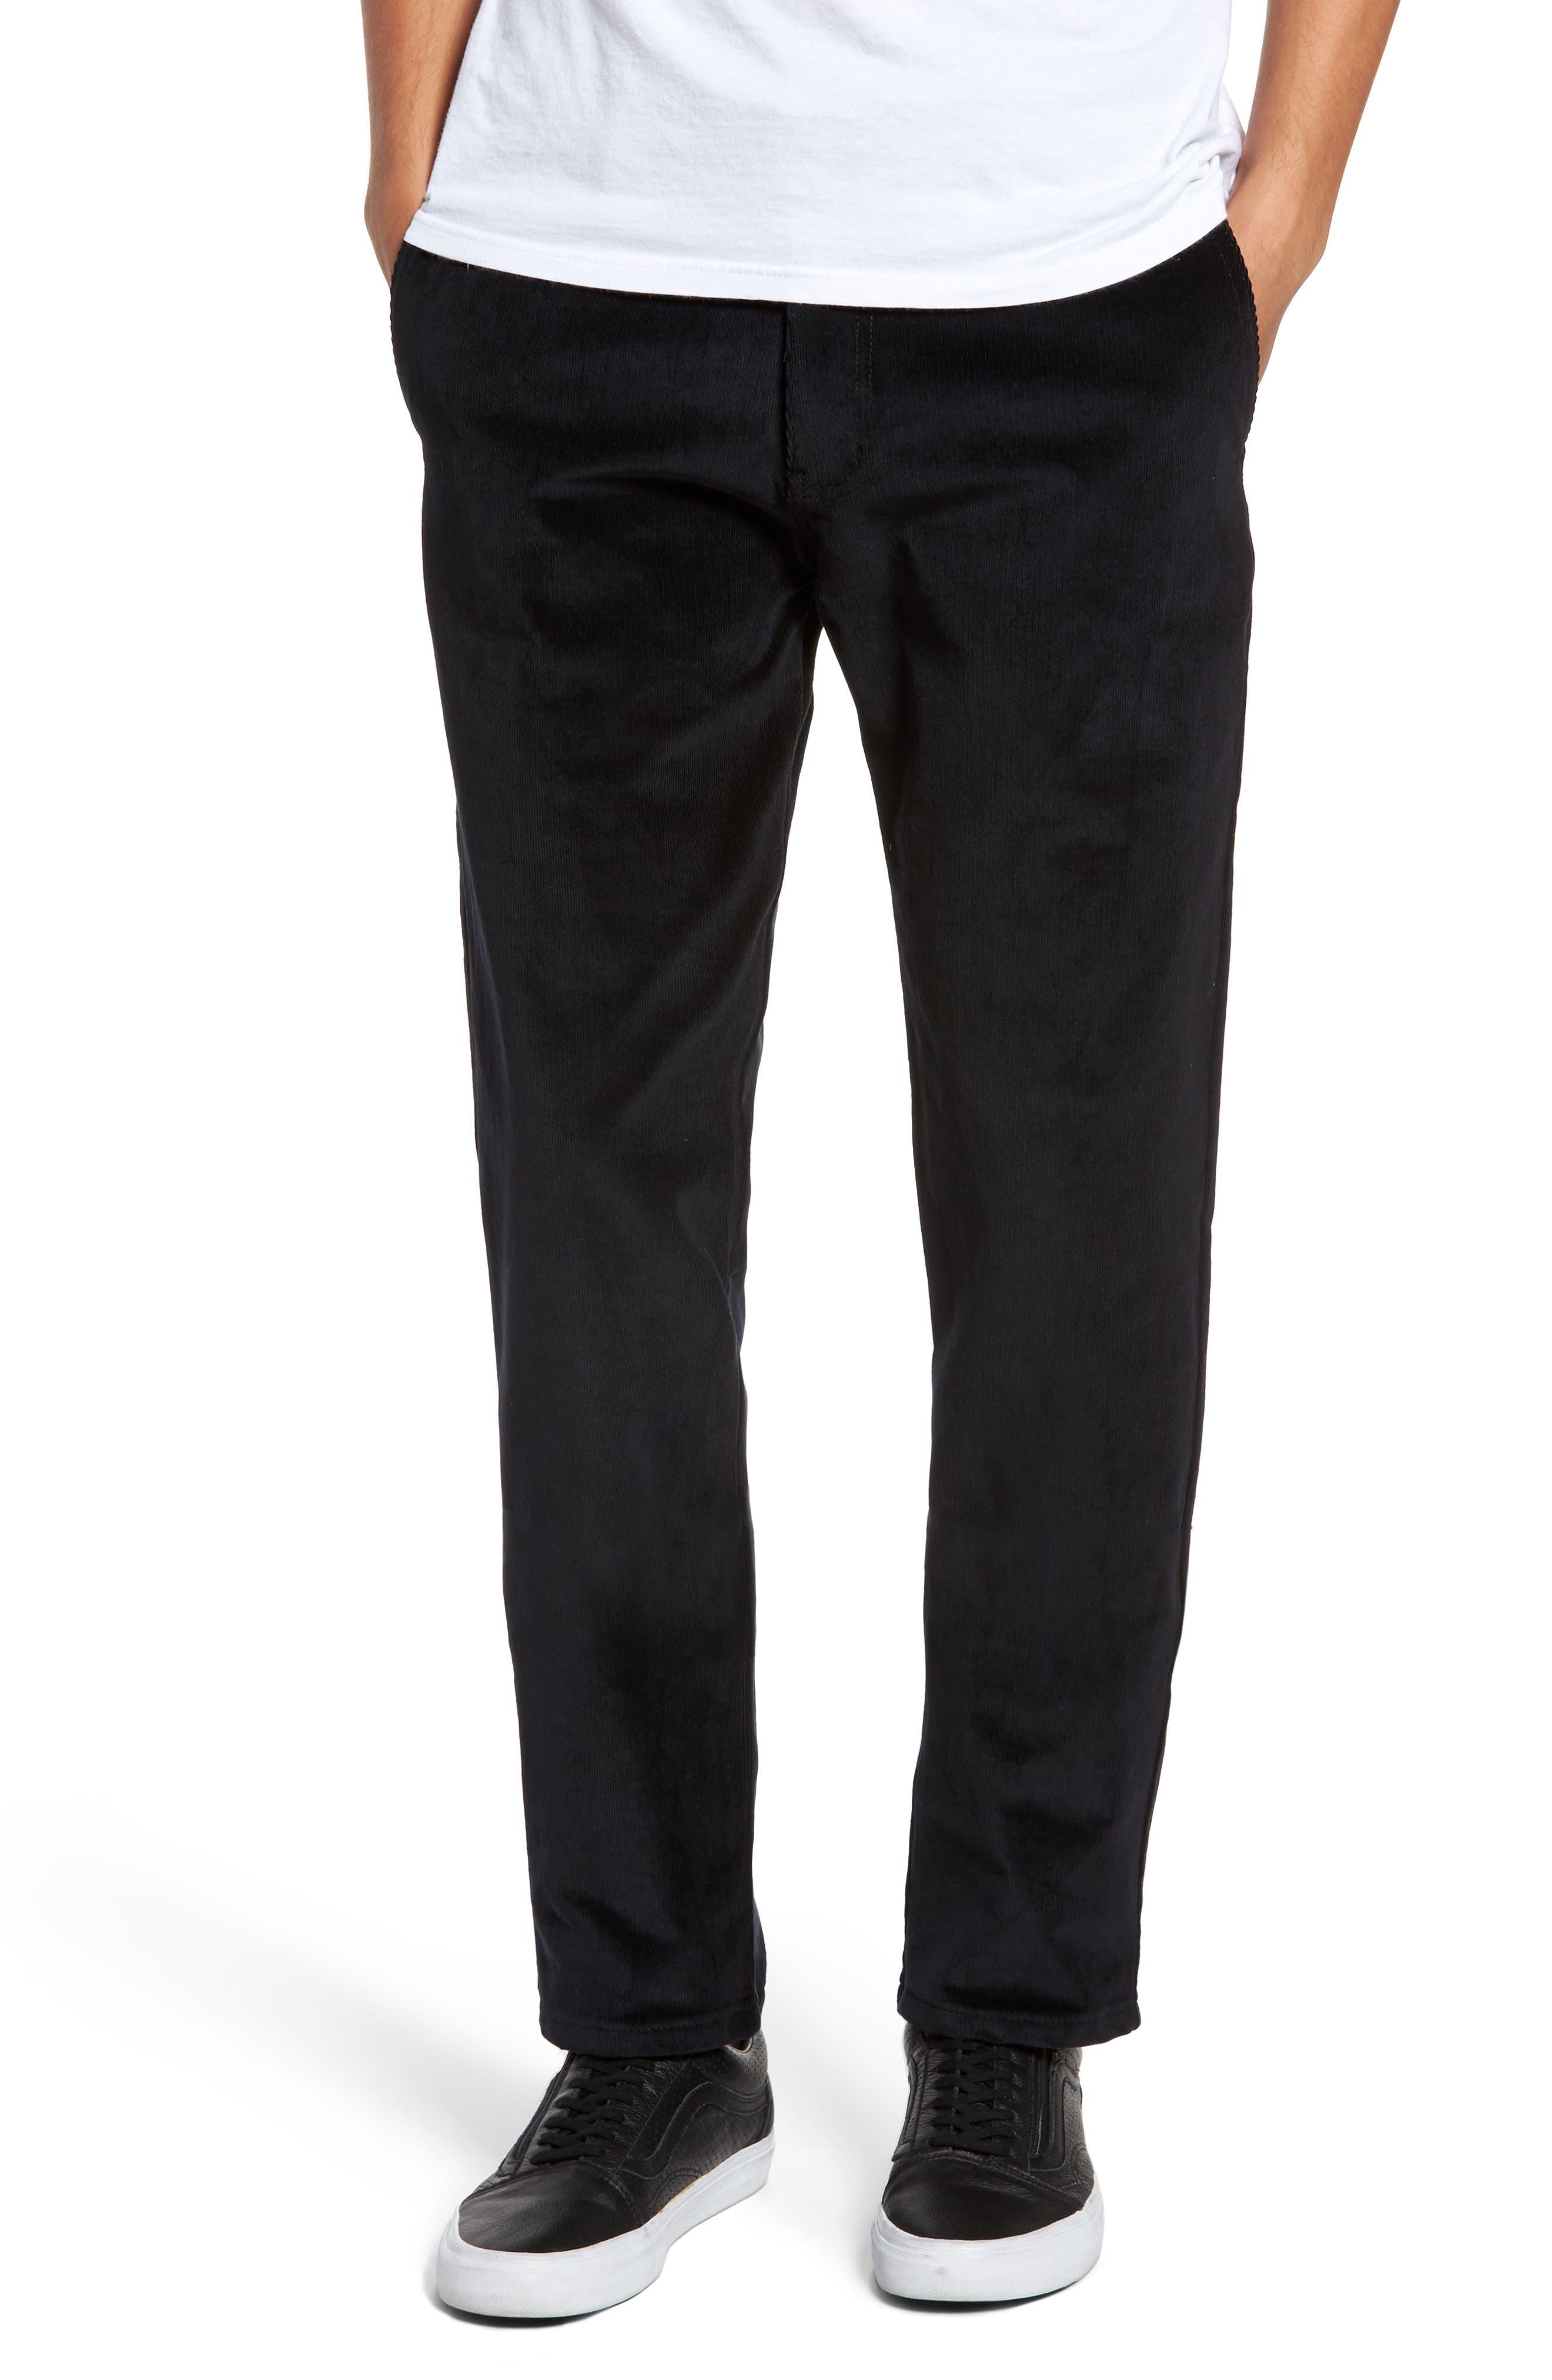 Naked & Famous Slim Chino Slim Fit Corduroy Pants,                             Main thumbnail 1, color,                             Black